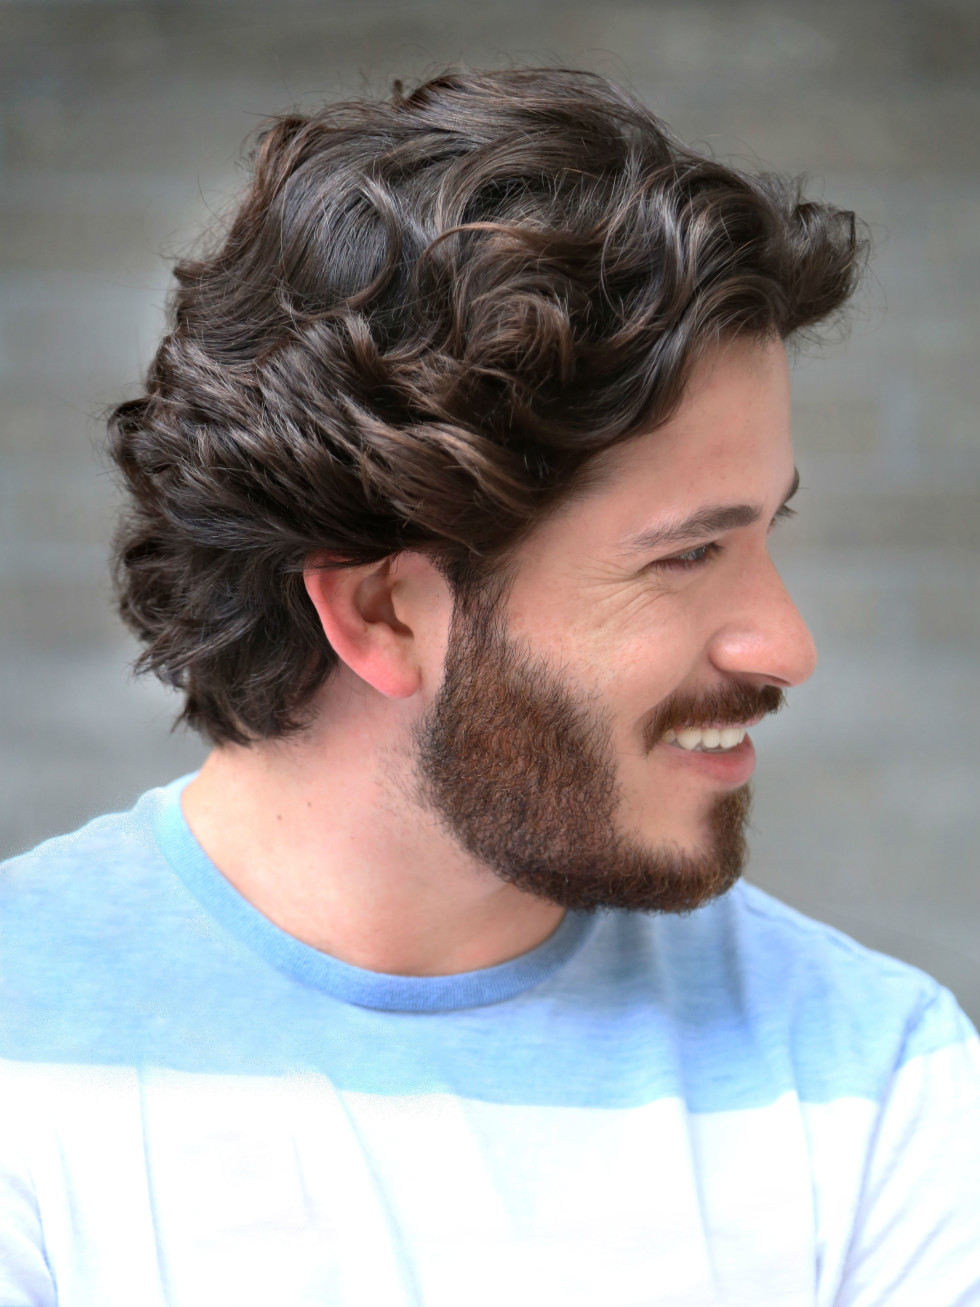 Jose Luis Salon - tousled texture